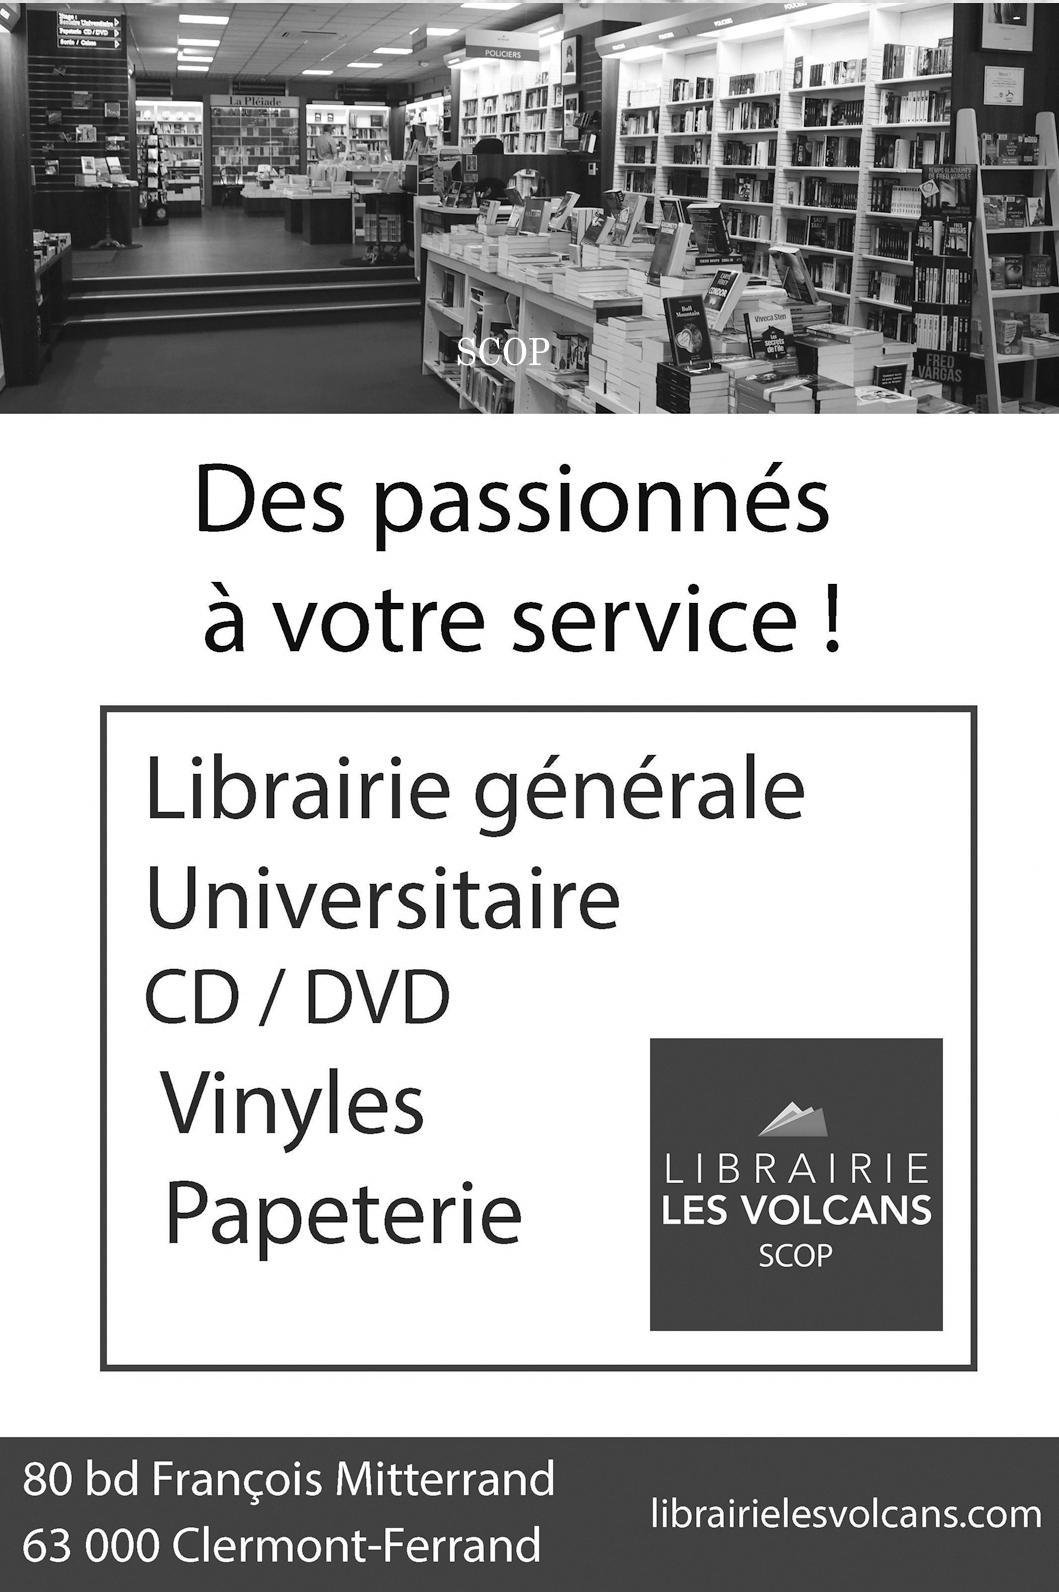 Librairie des volcans